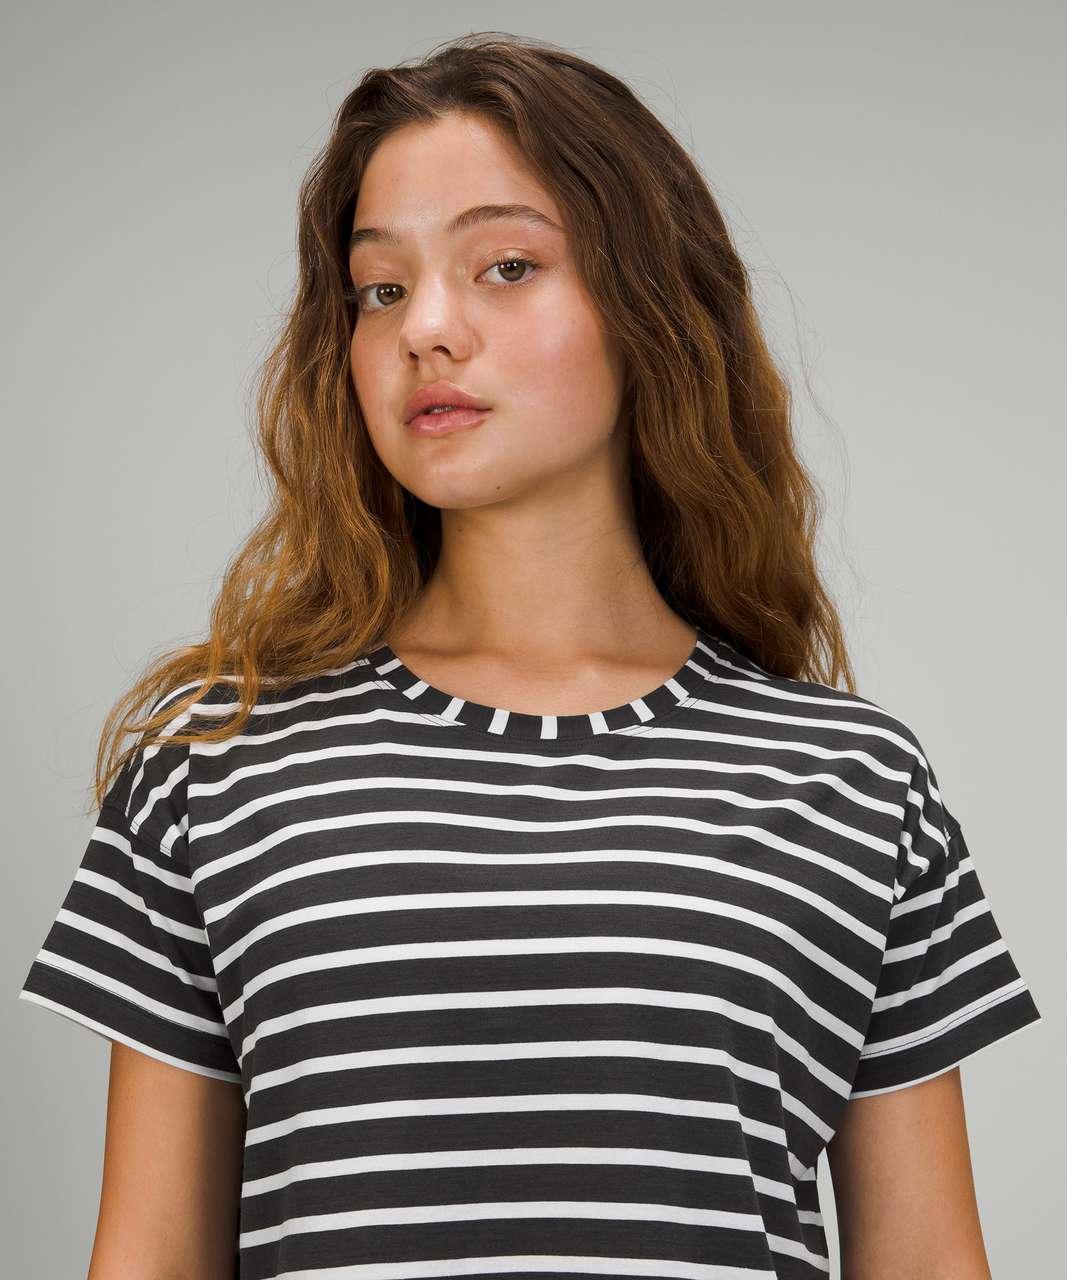 Lululemon Cates Tee - Yachtie Stripe Graphite Grey White